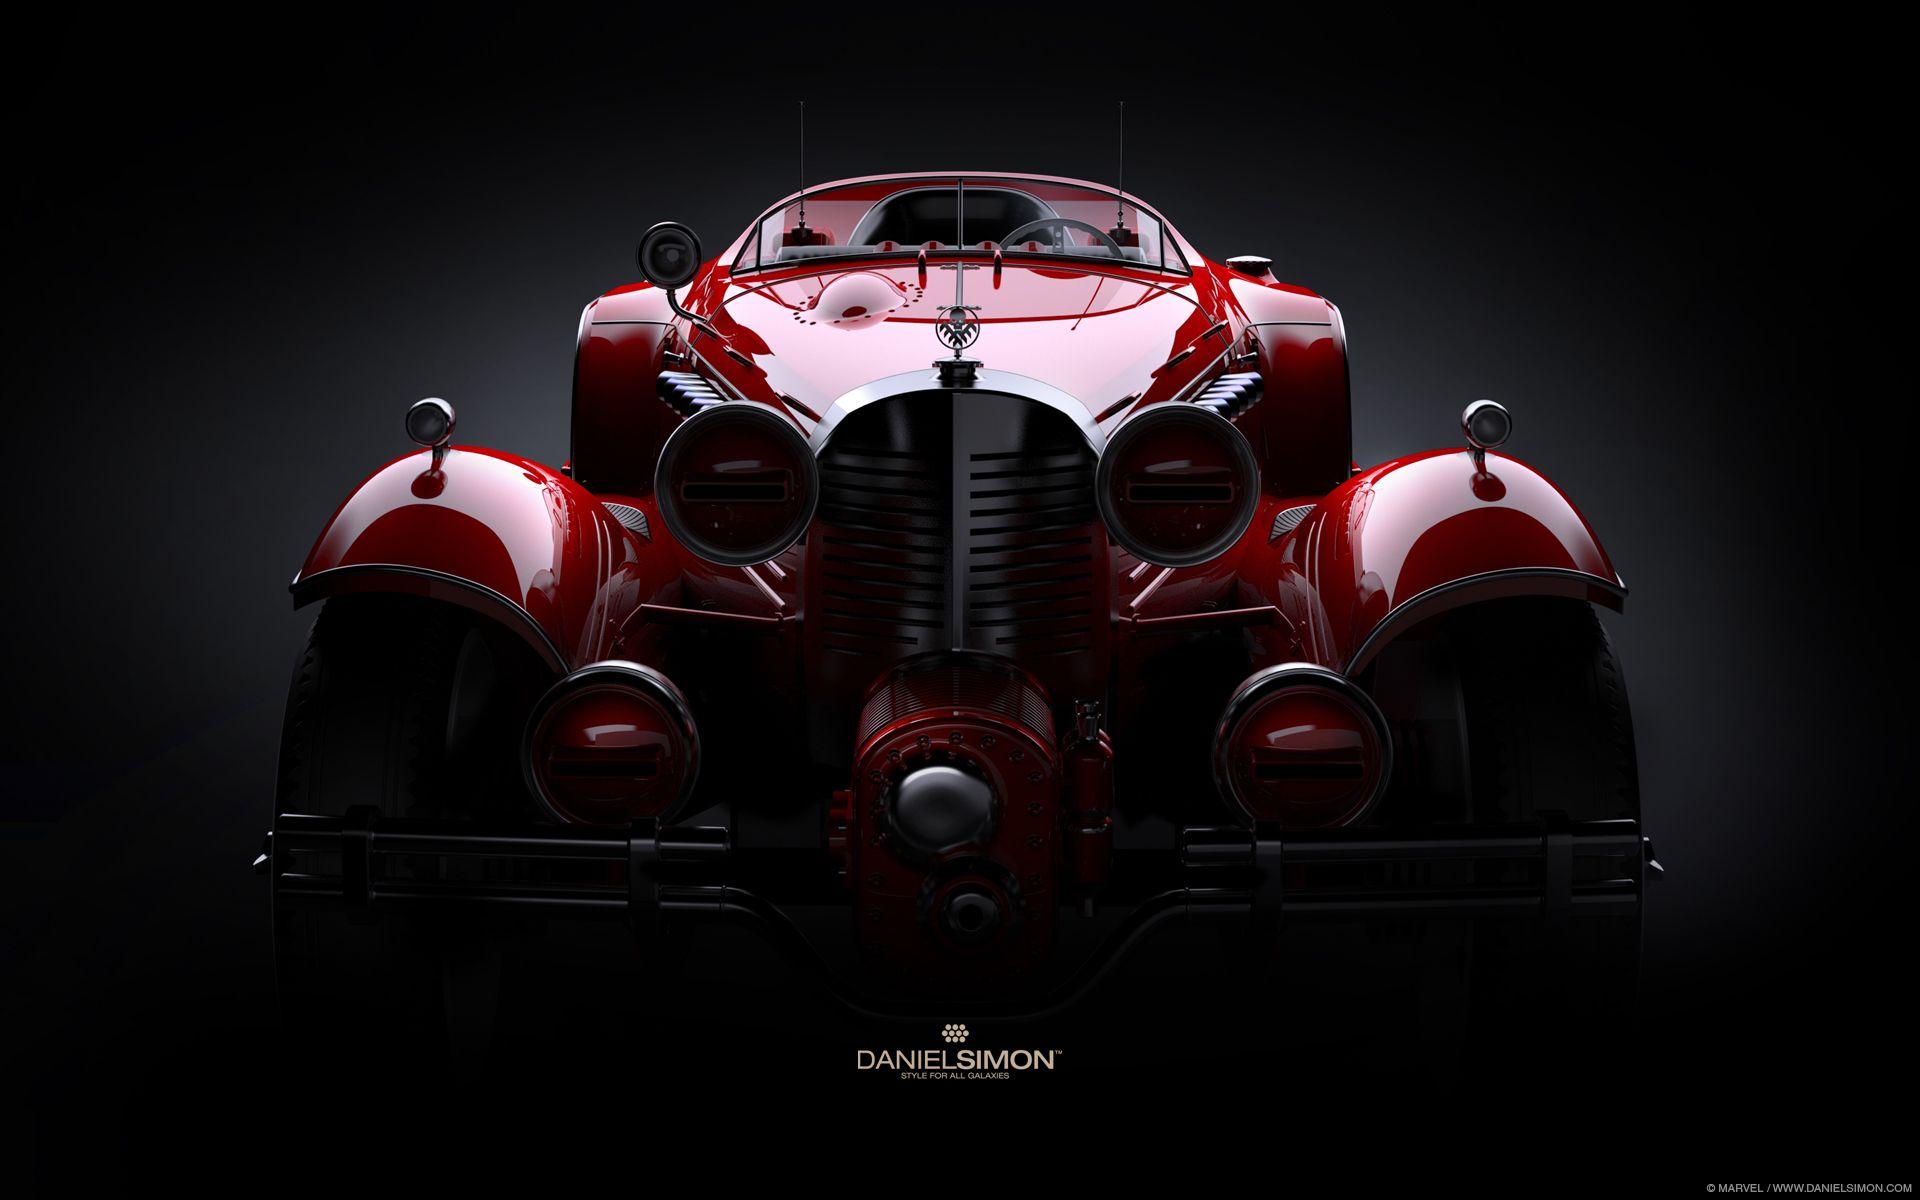 Captain America Tron Concept Designs By Daniel Simon Dream Cars Concept Cars Roadsters